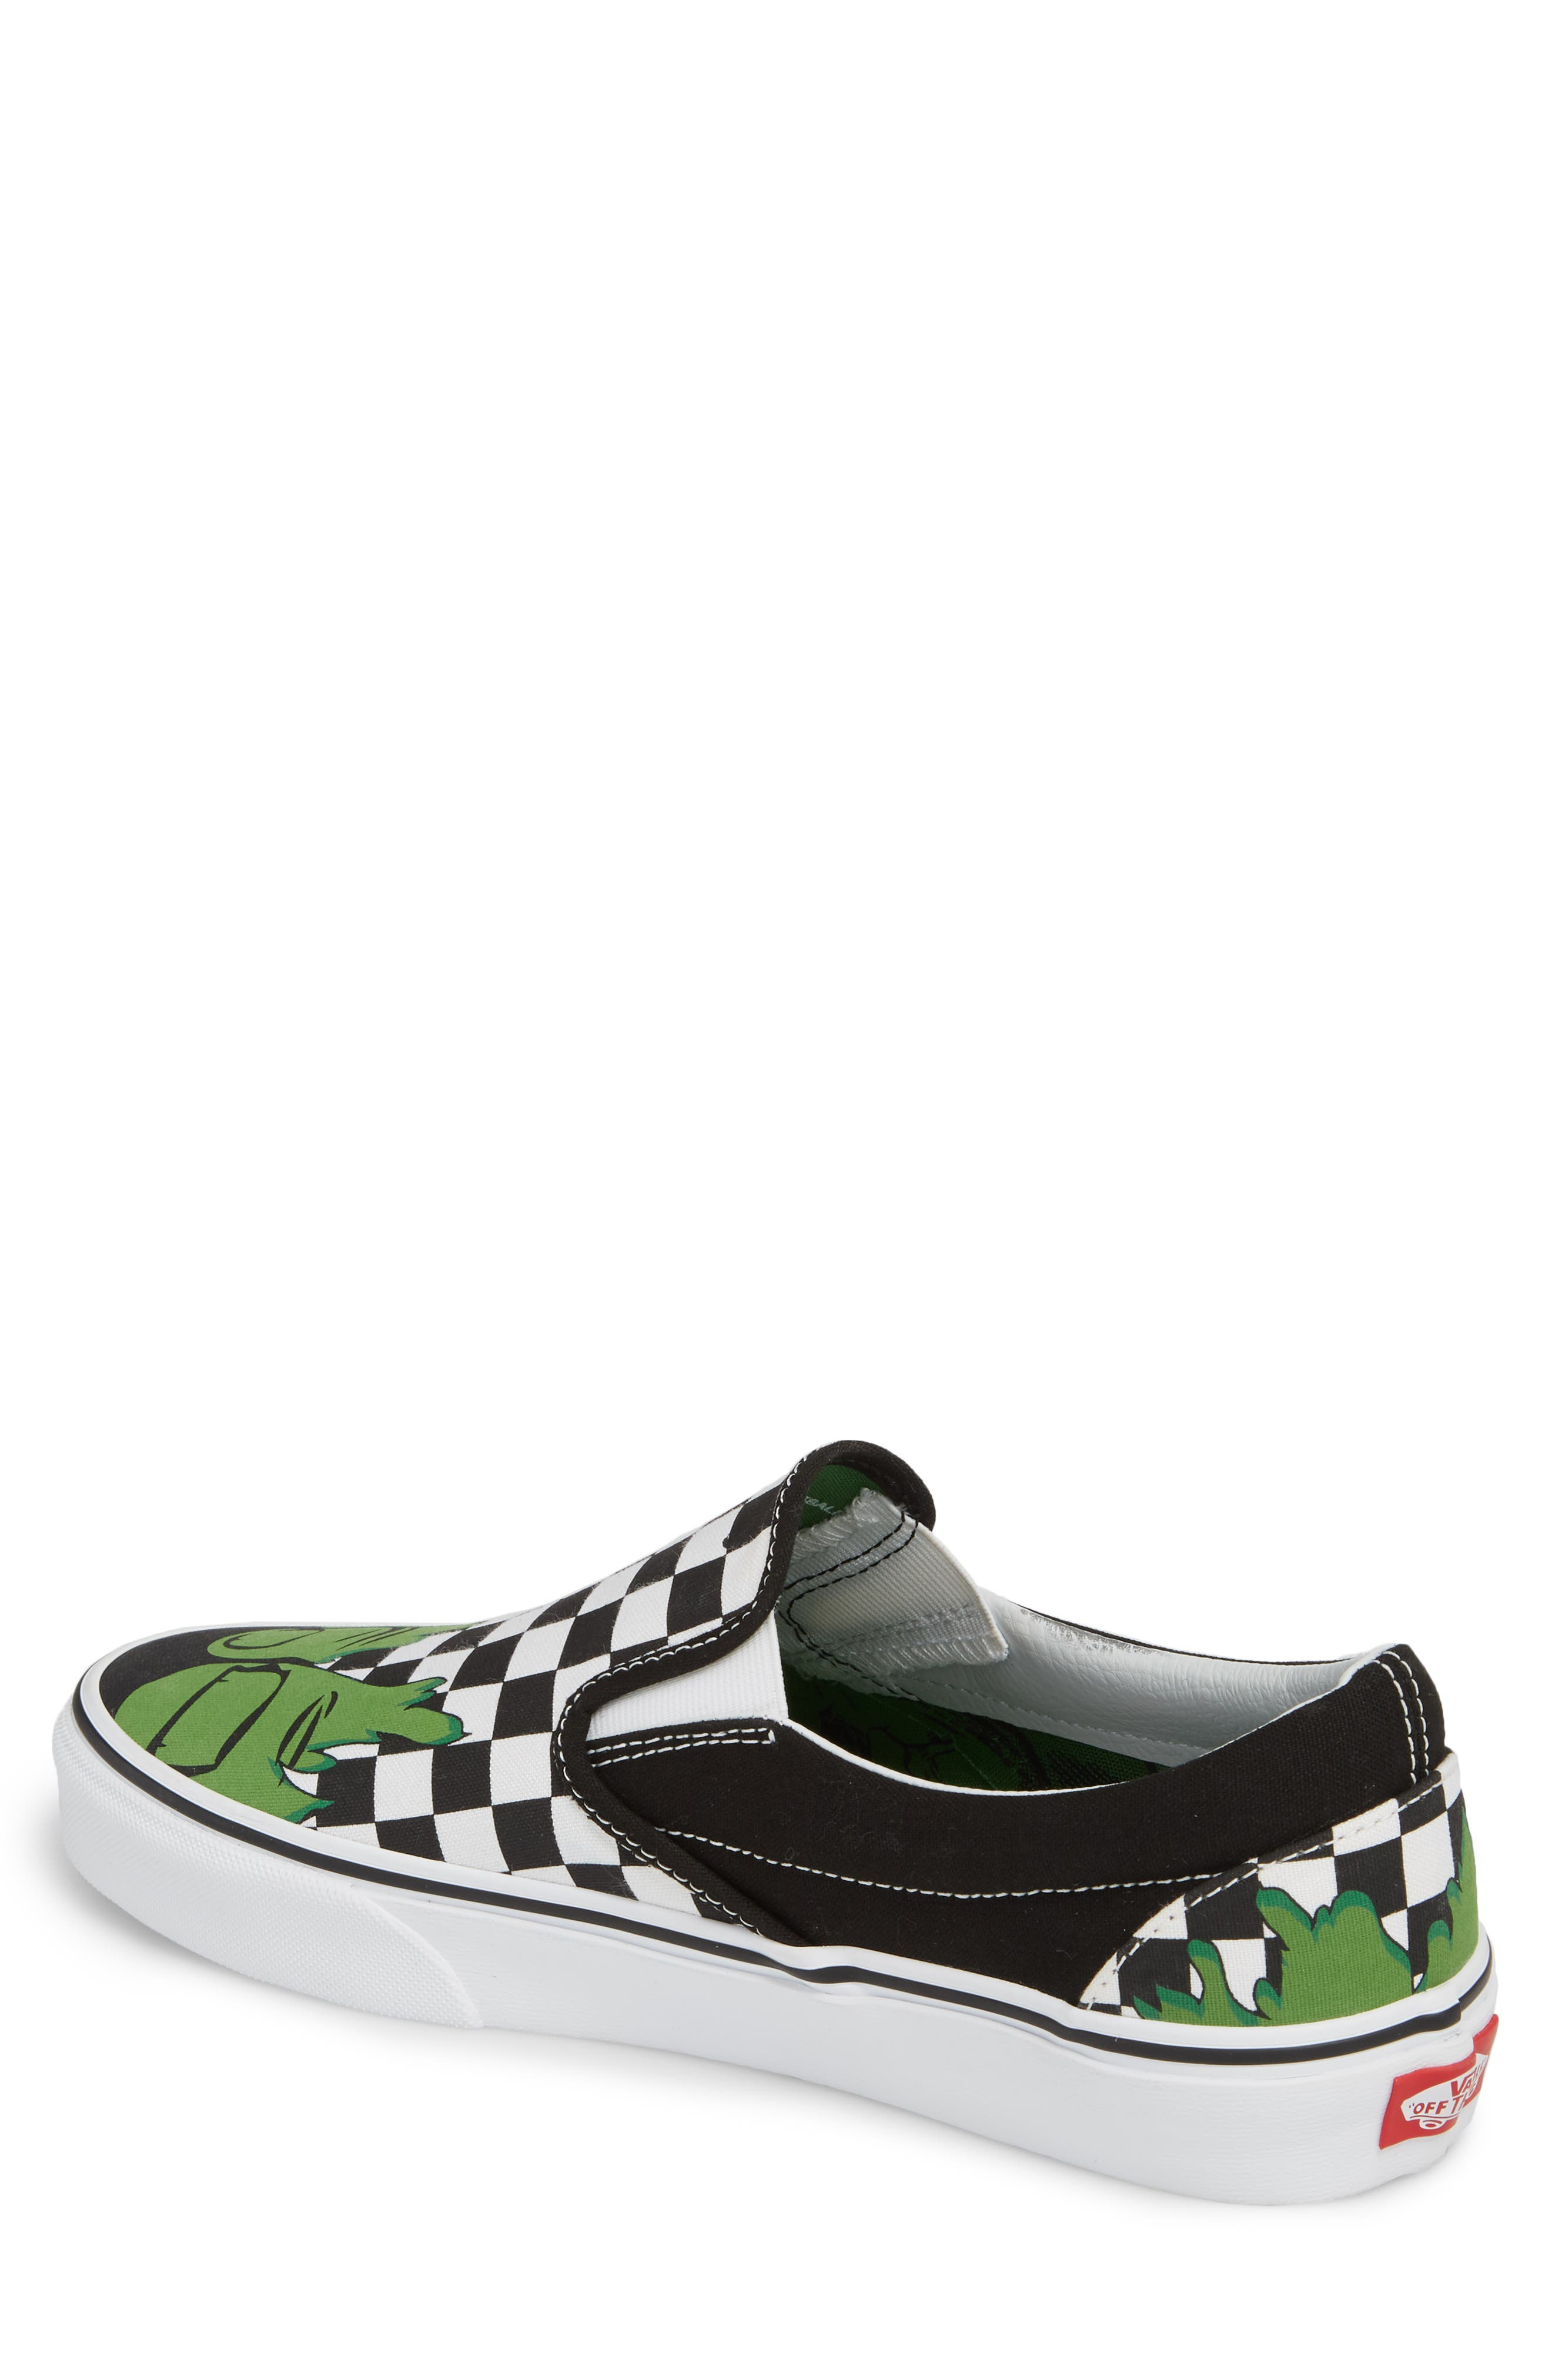 Marvel UA Classic Slip-On Sneaker,                             Alternate thumbnail 2, color,                             Checkerboard Textile